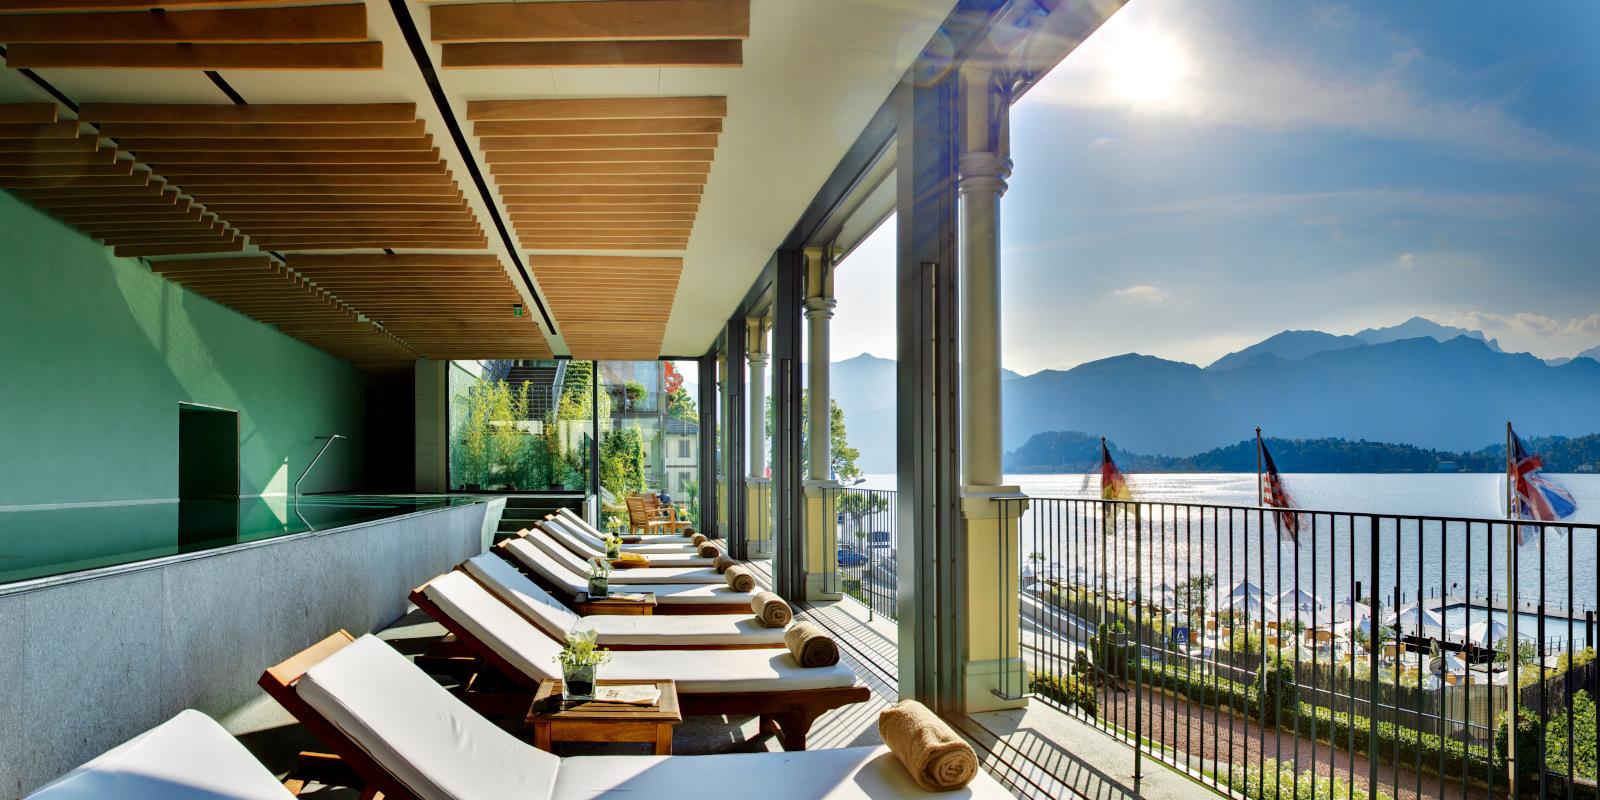 Hotel Spa And Wellness Center With Pool At Lake Como In Bellagio Grand Hotel Tremezzo